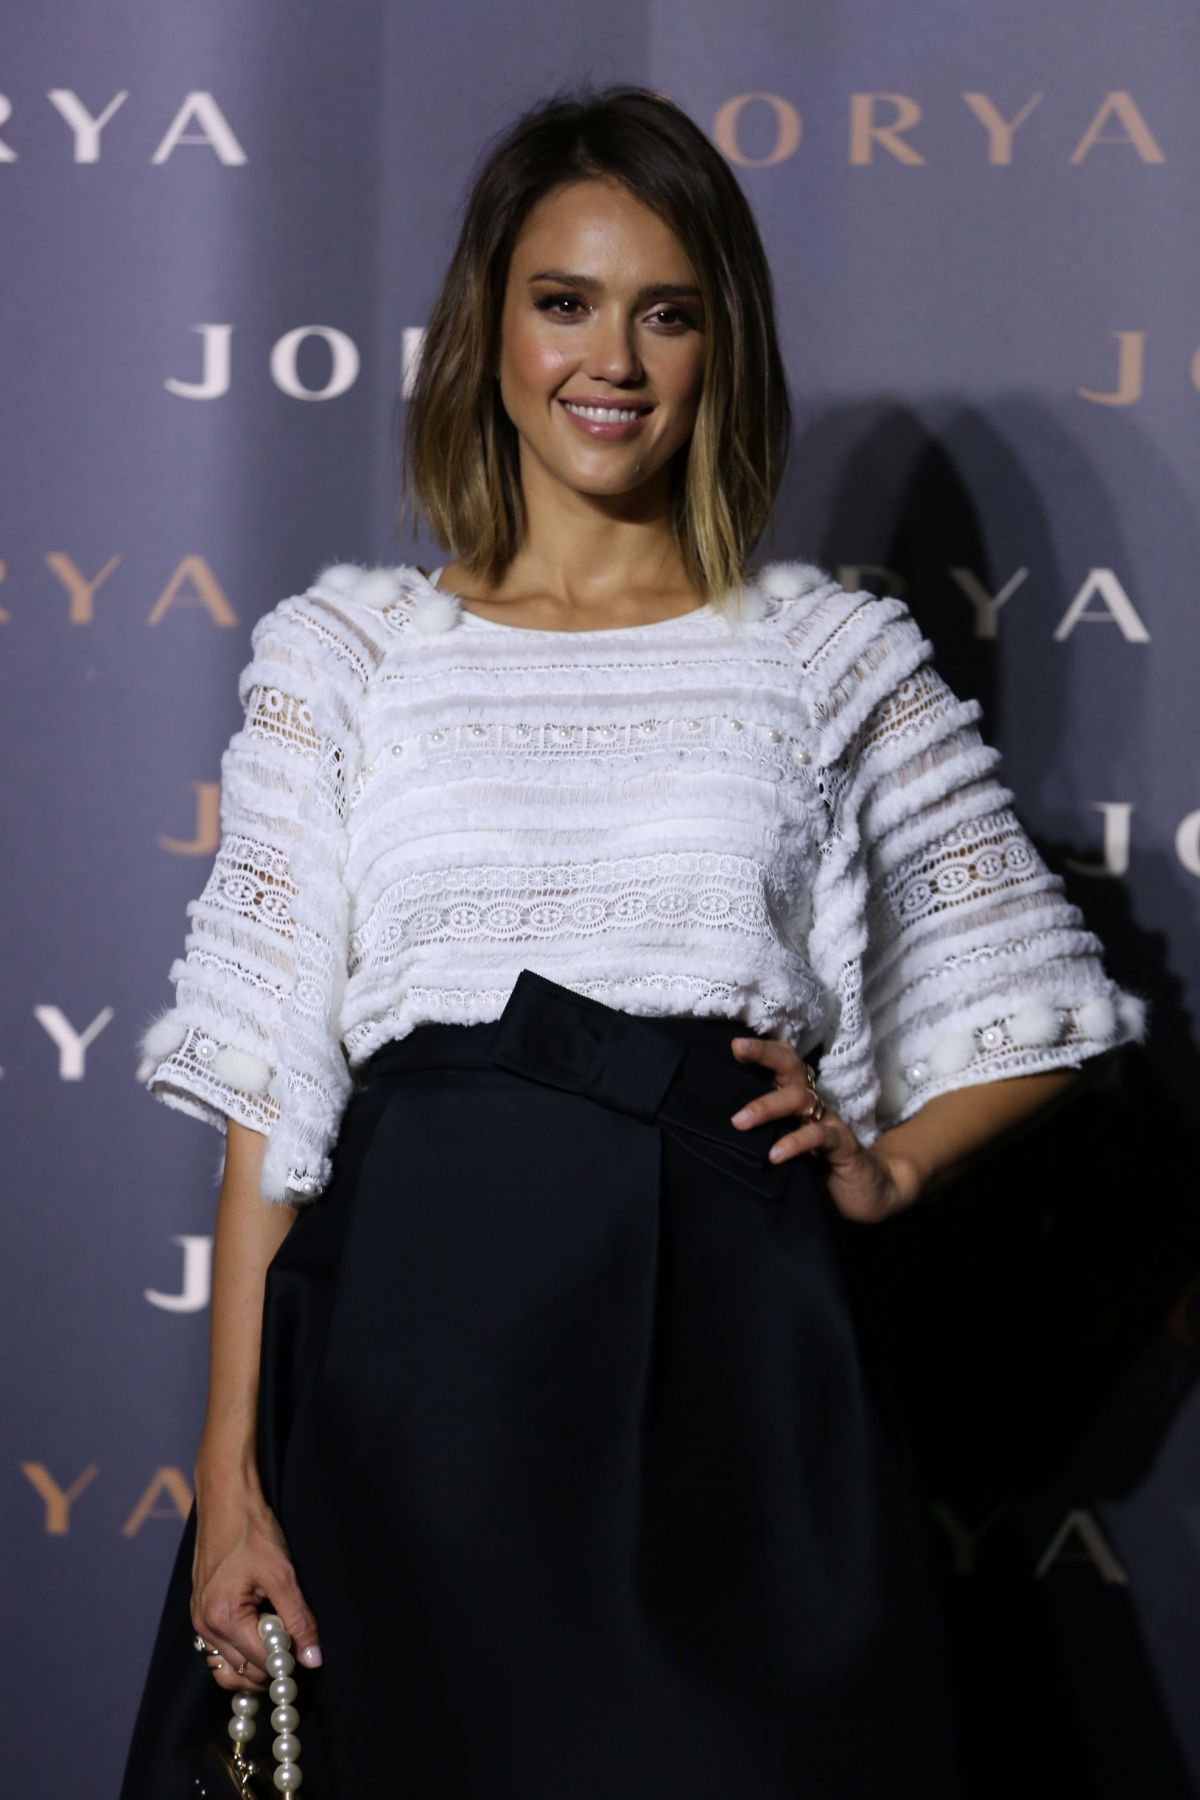 JESSICA ALBA at Jorya 2015 Fashion Exhibition Reelection New York in Shanghai